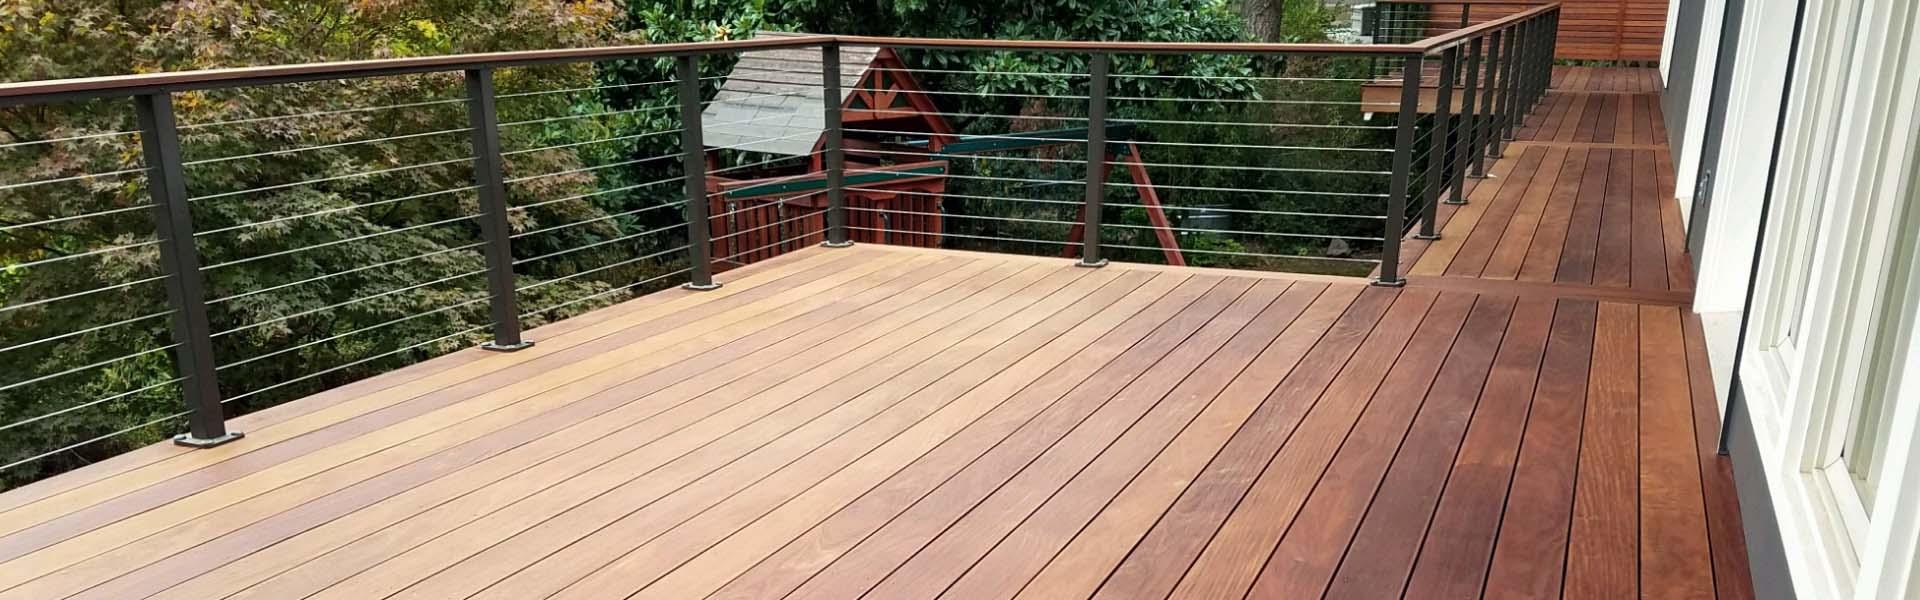 custom deck builder point pleasant NJ Ipe Deck wire railing